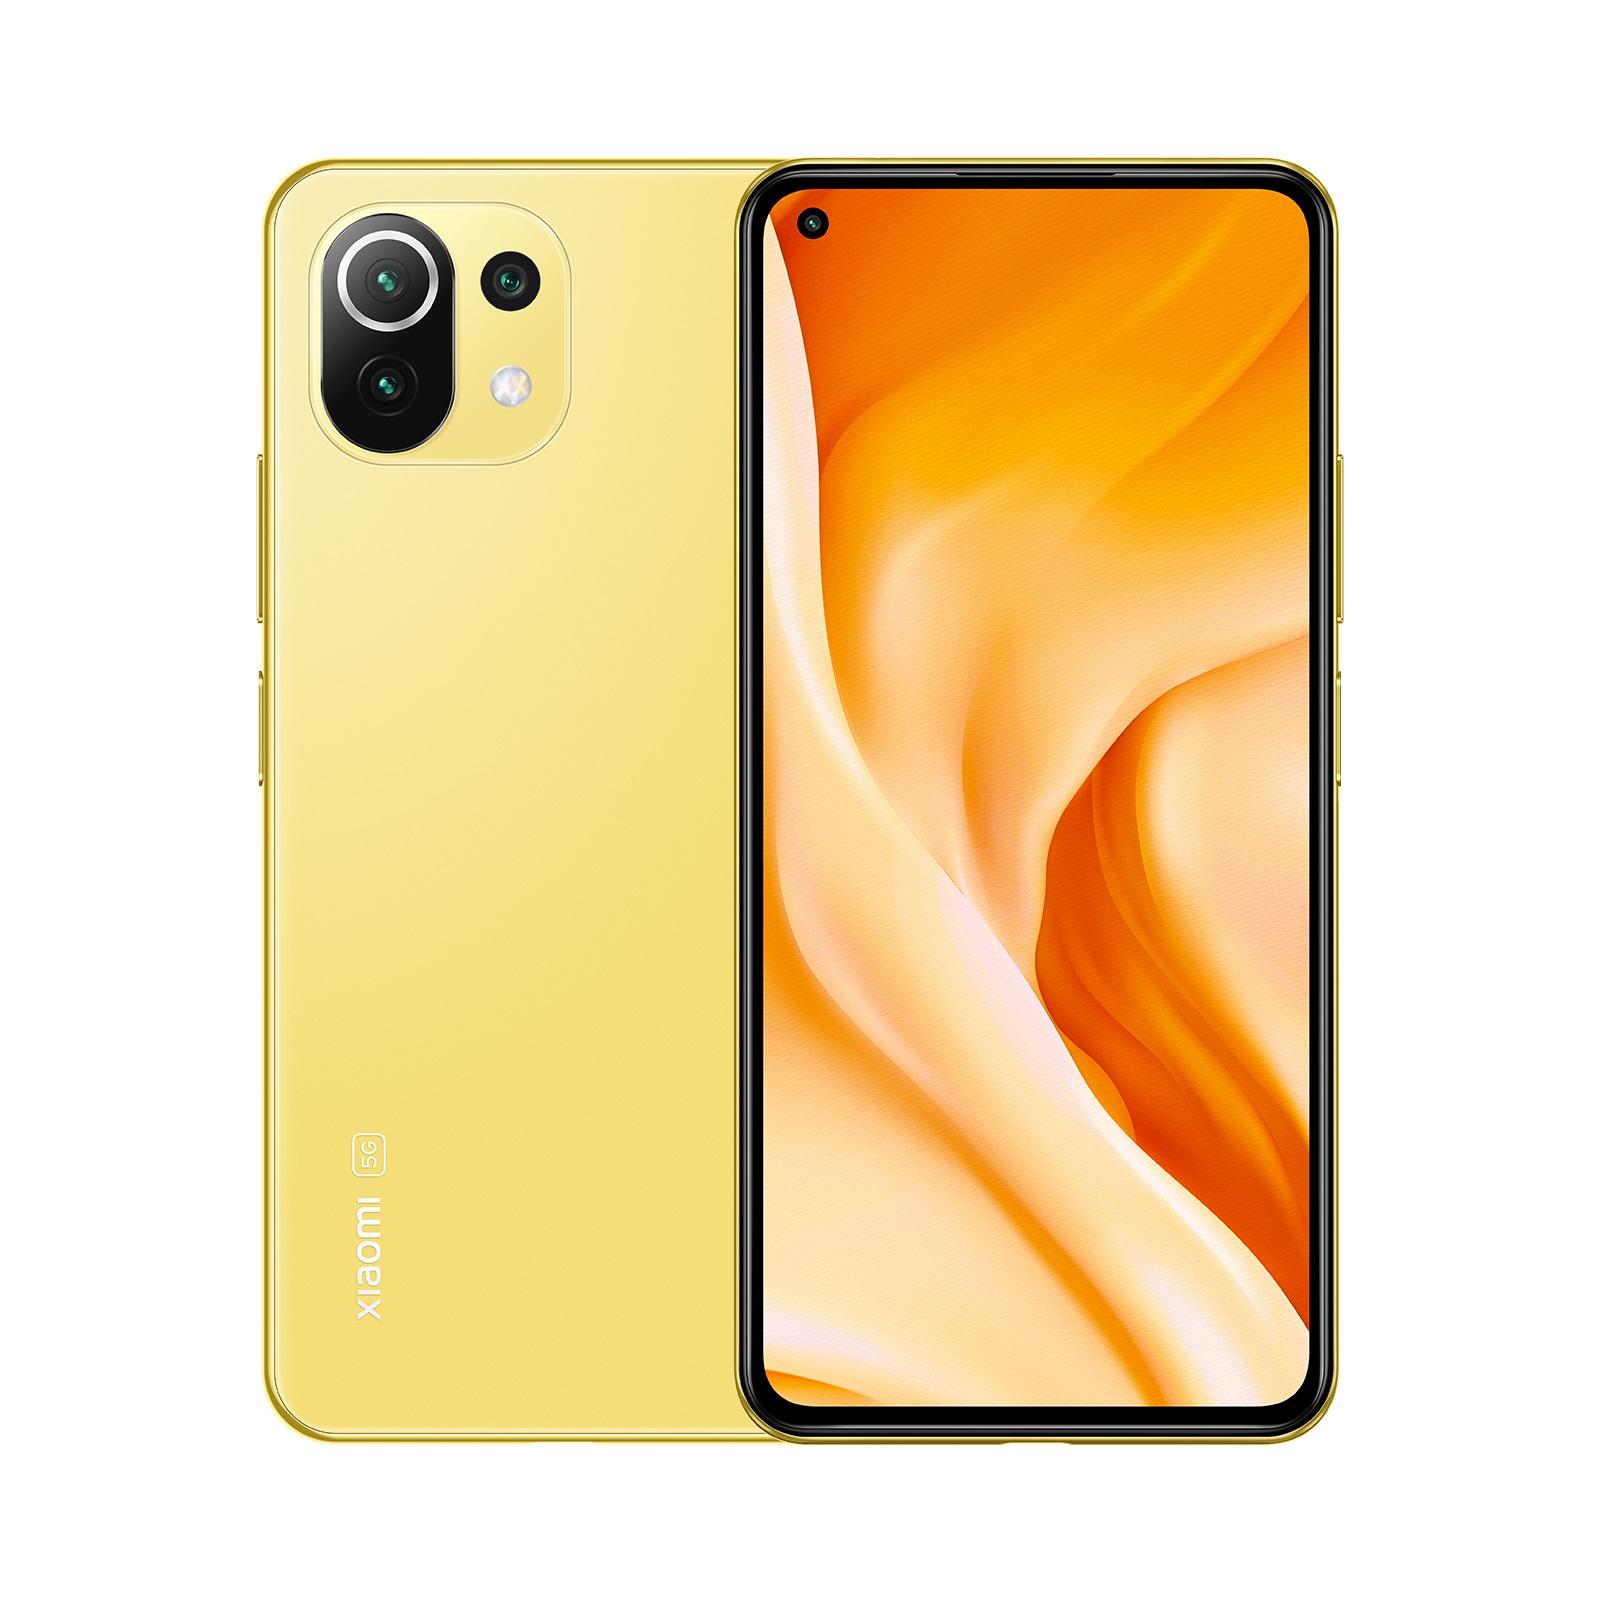 smartfon Xiaomi Mi 11 Lite 5G smartphone